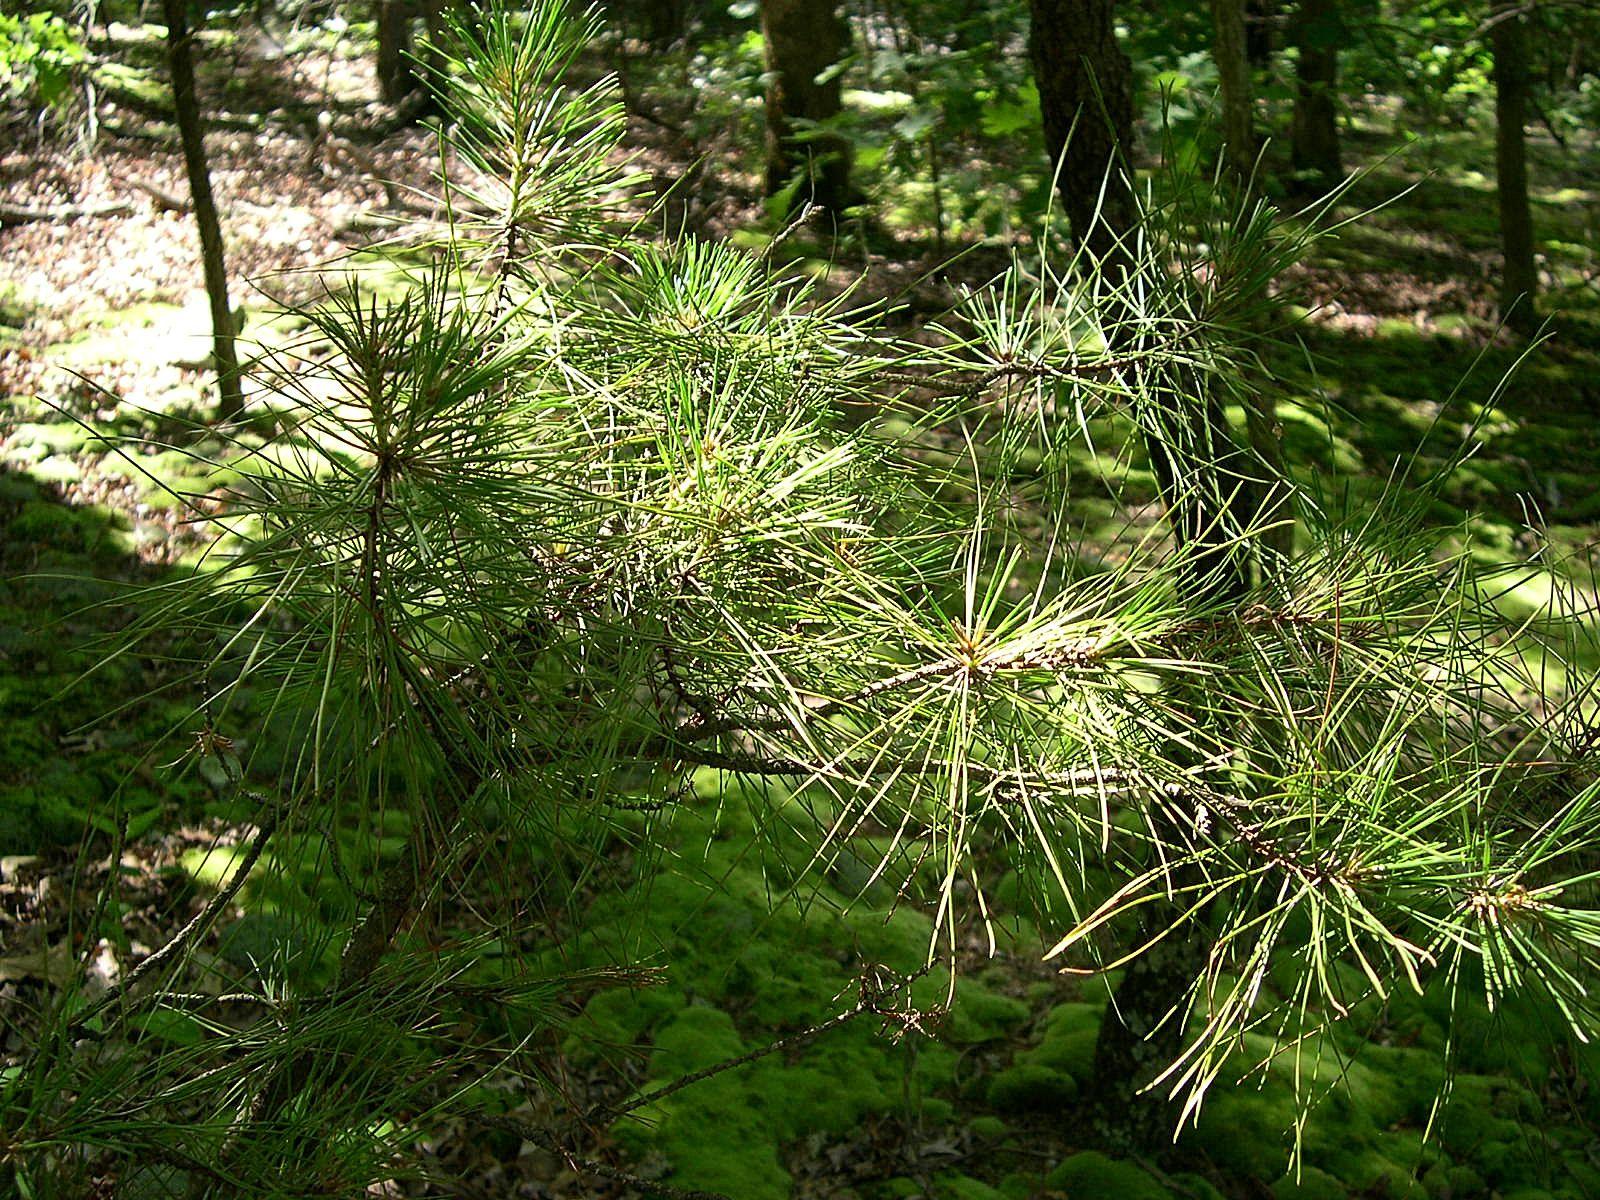 Shortleaf pine sapling